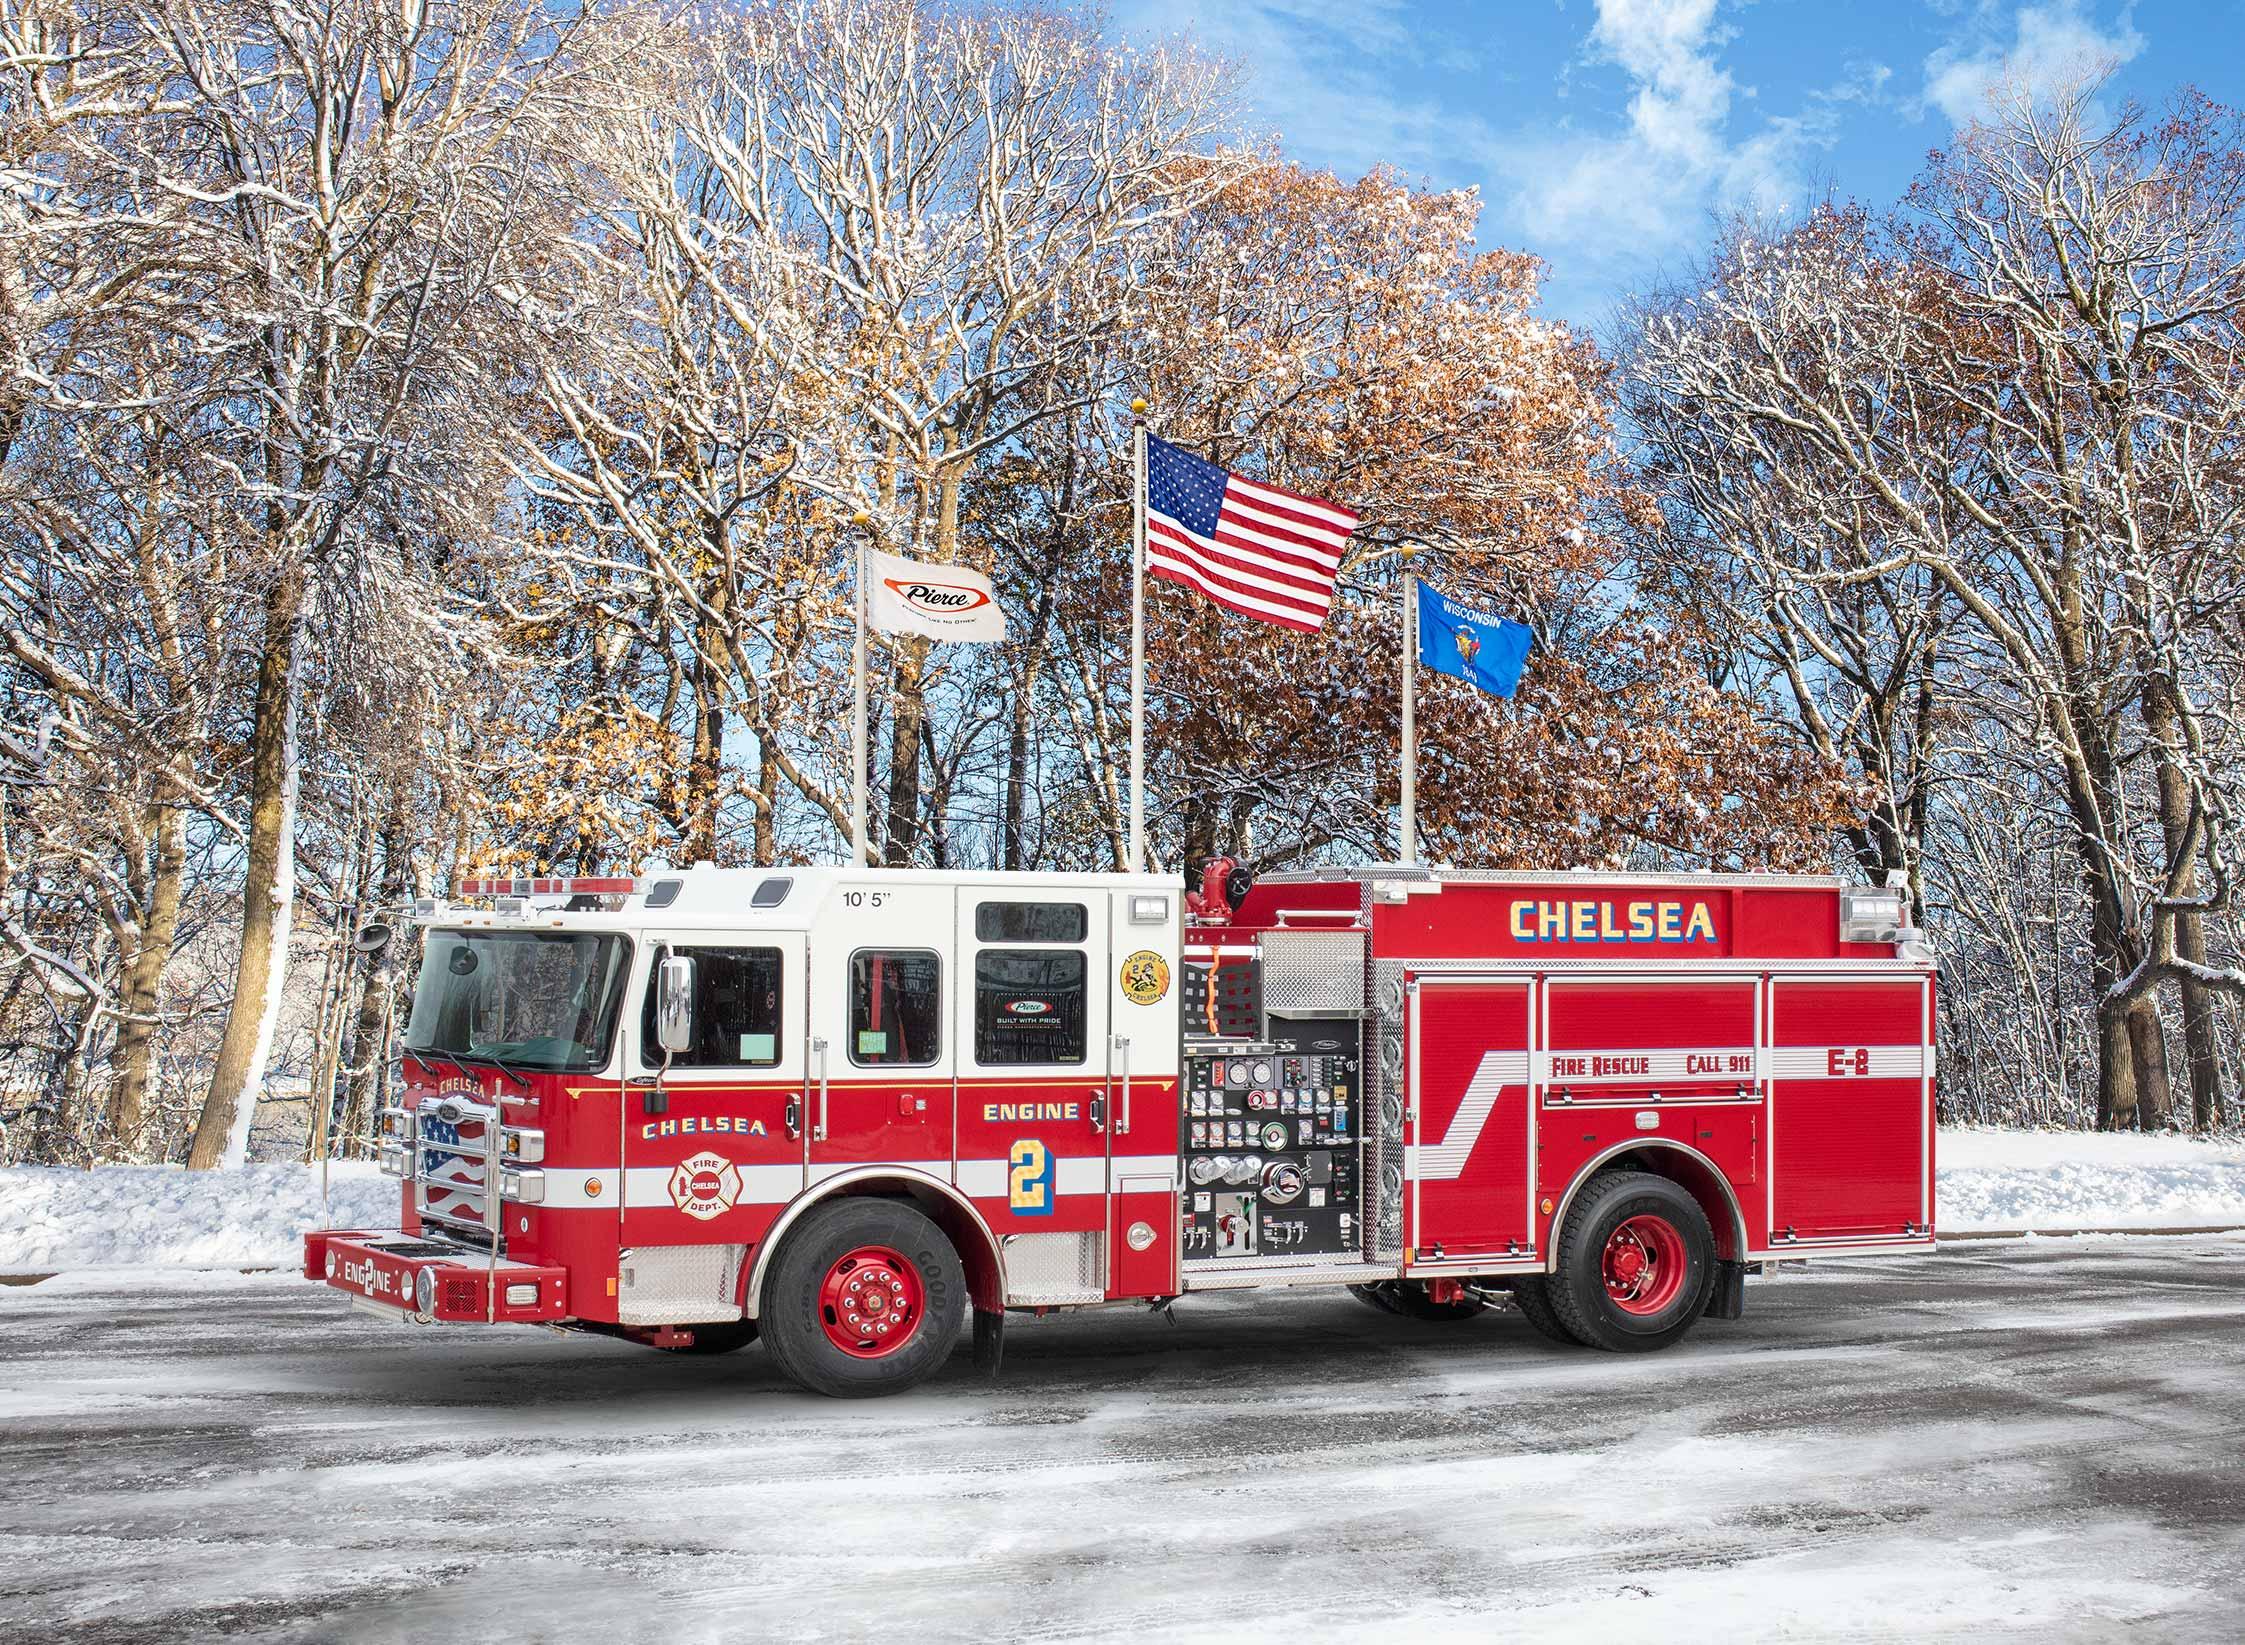 Chelsea Fire Department - Pumper